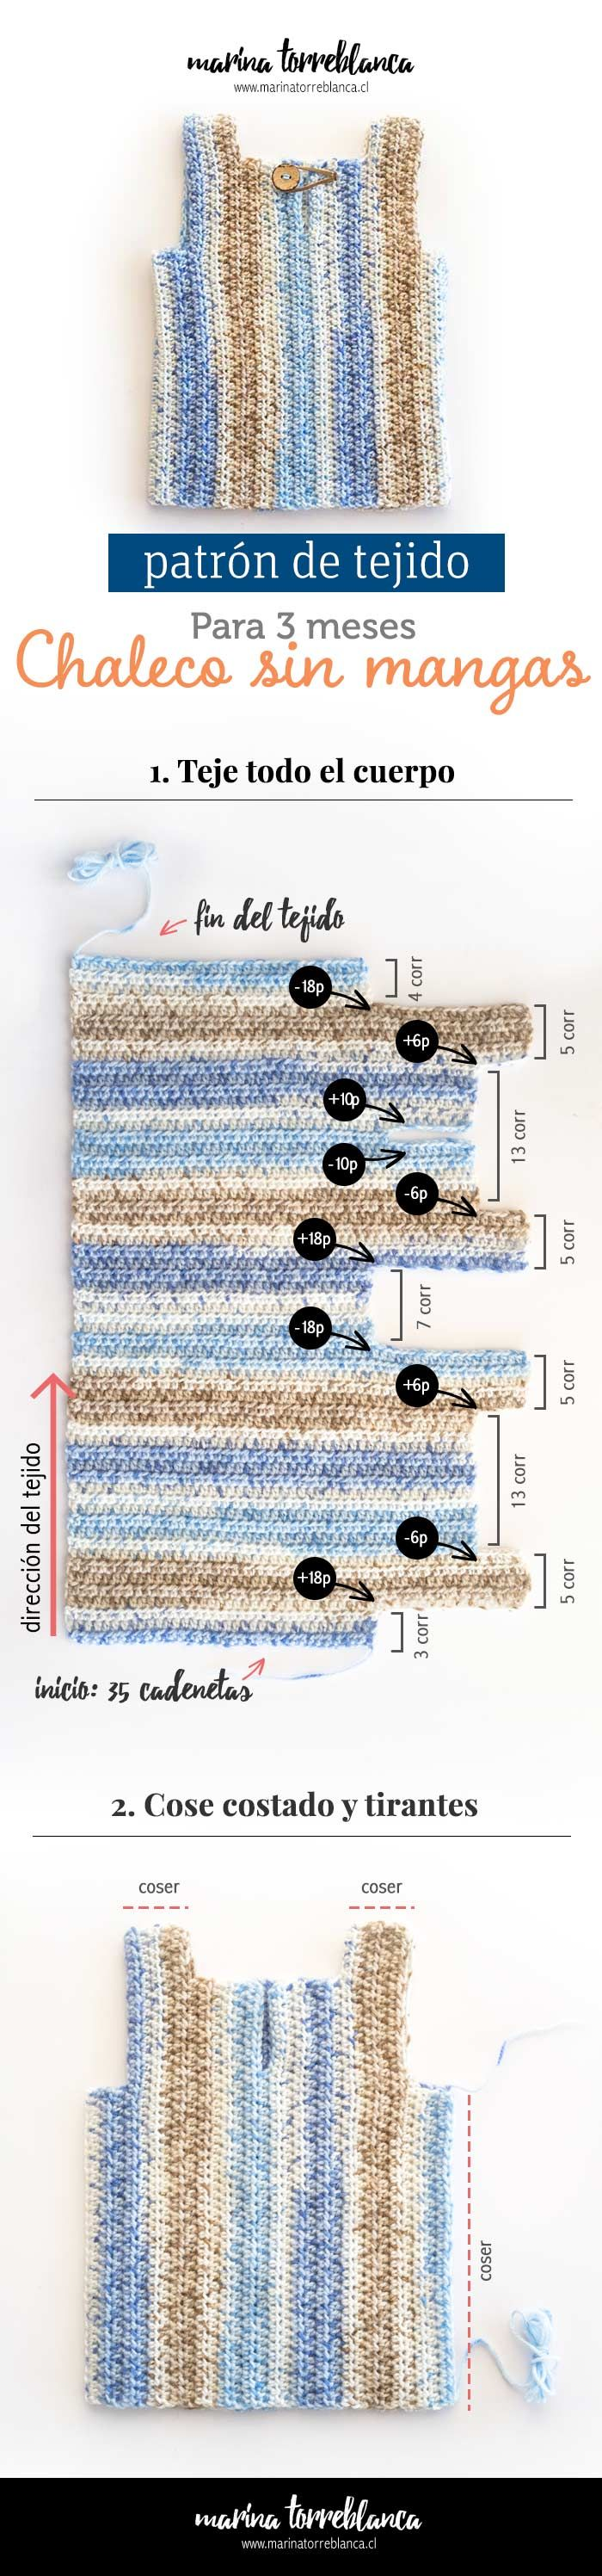 Chaleco sin mangas a crochet para 3 meses [Patron de tejido ...